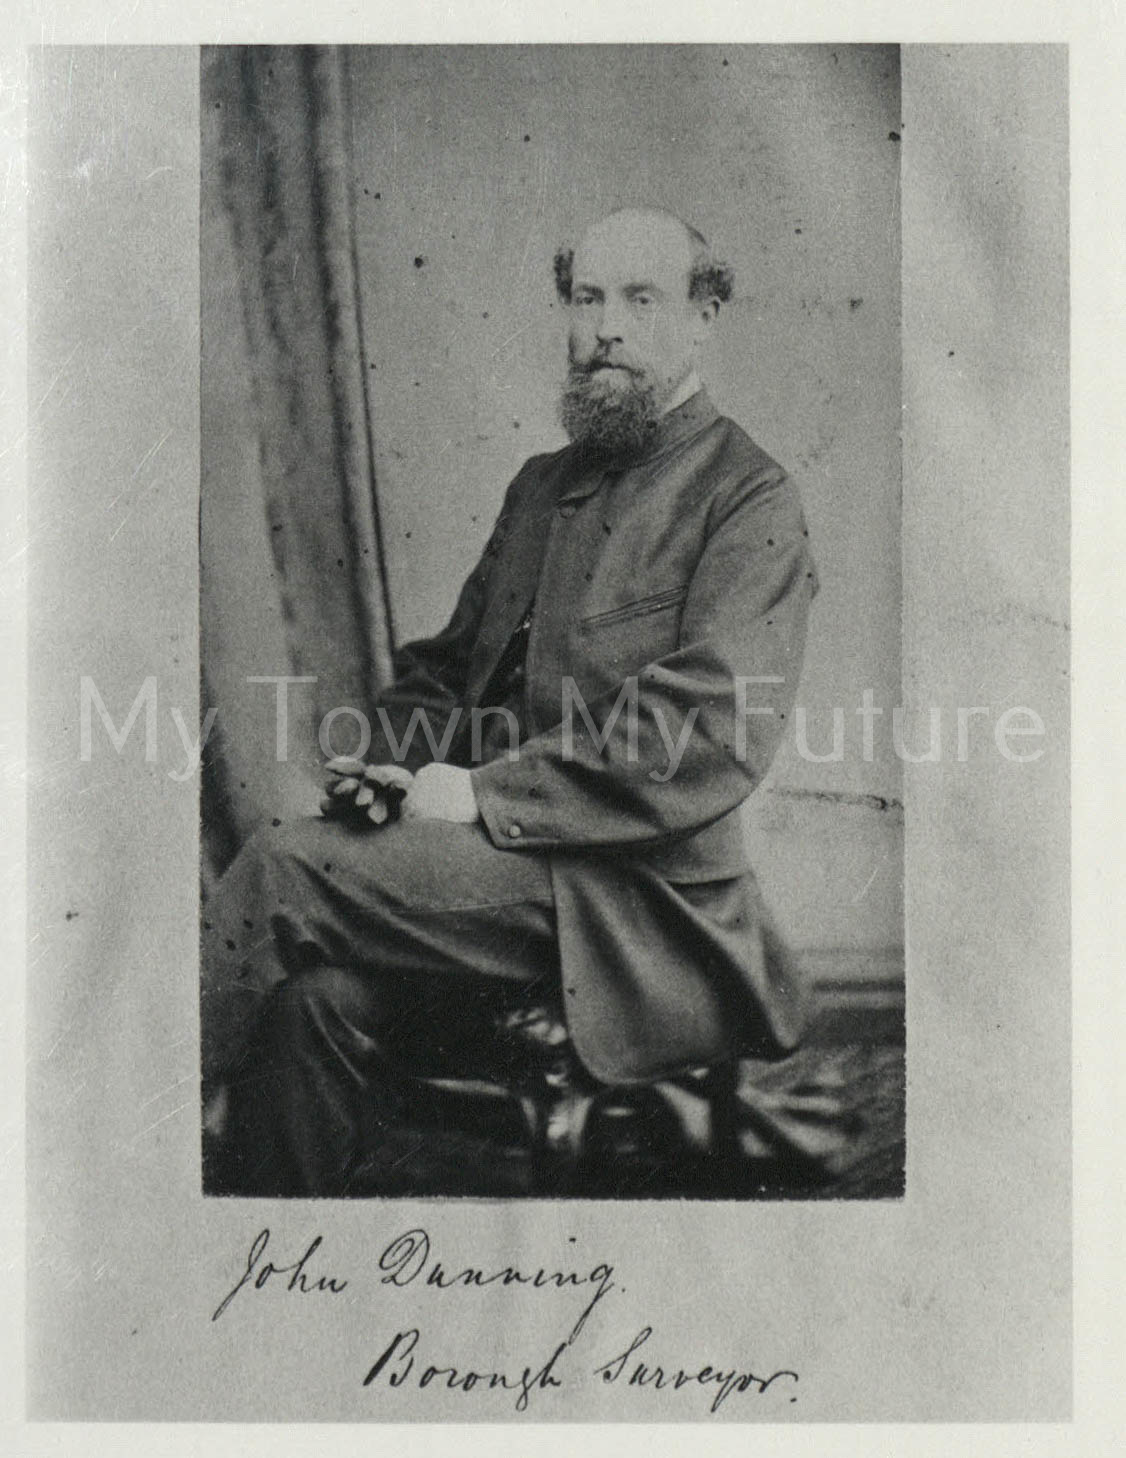 John Dunning, Borough Surveyor